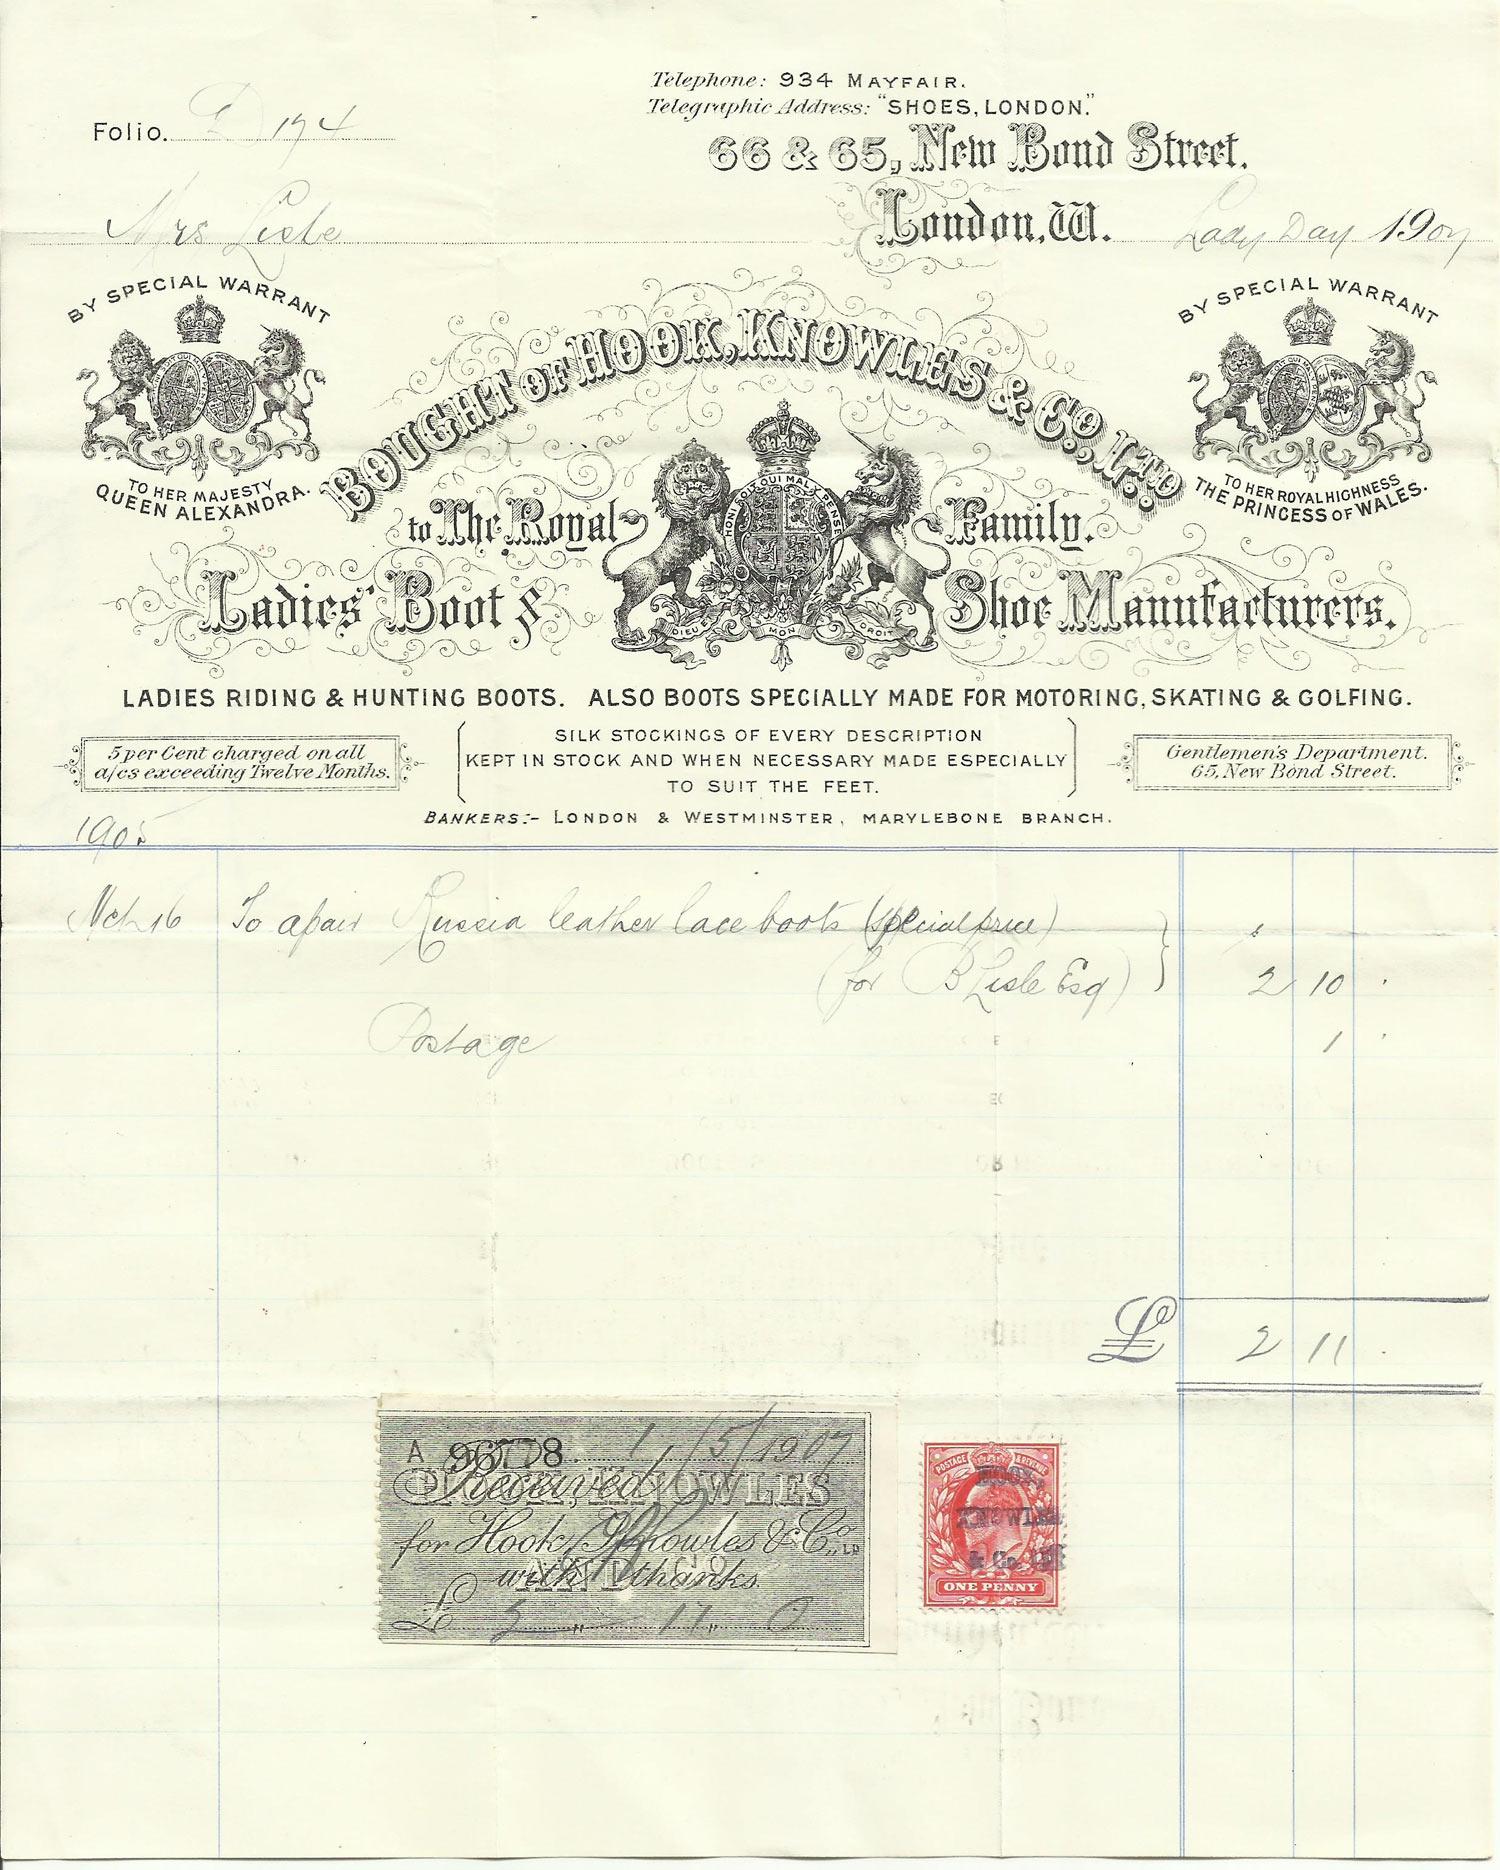 Hook-Knowles - original bill